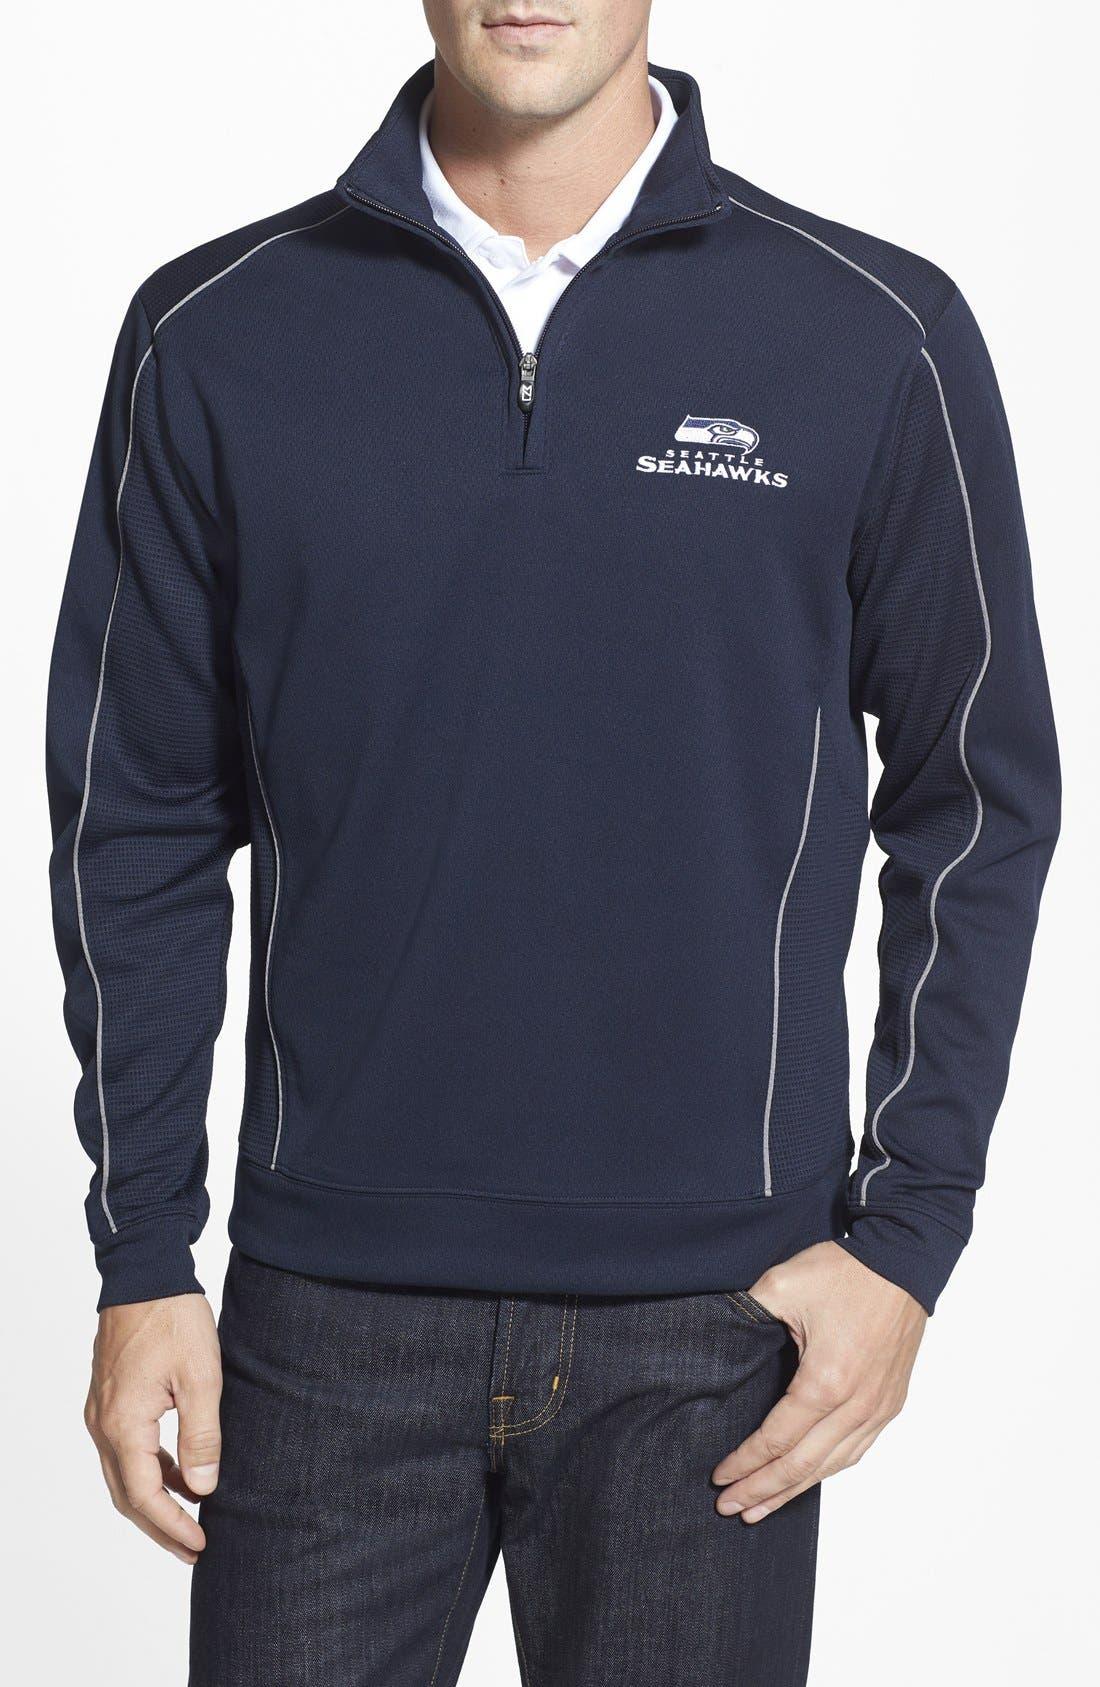 Alternate Image 1 Selected - Cutter & Buck Seattle Seahawks - Edge DryTec Moisture Wicking Half Zip Pullover